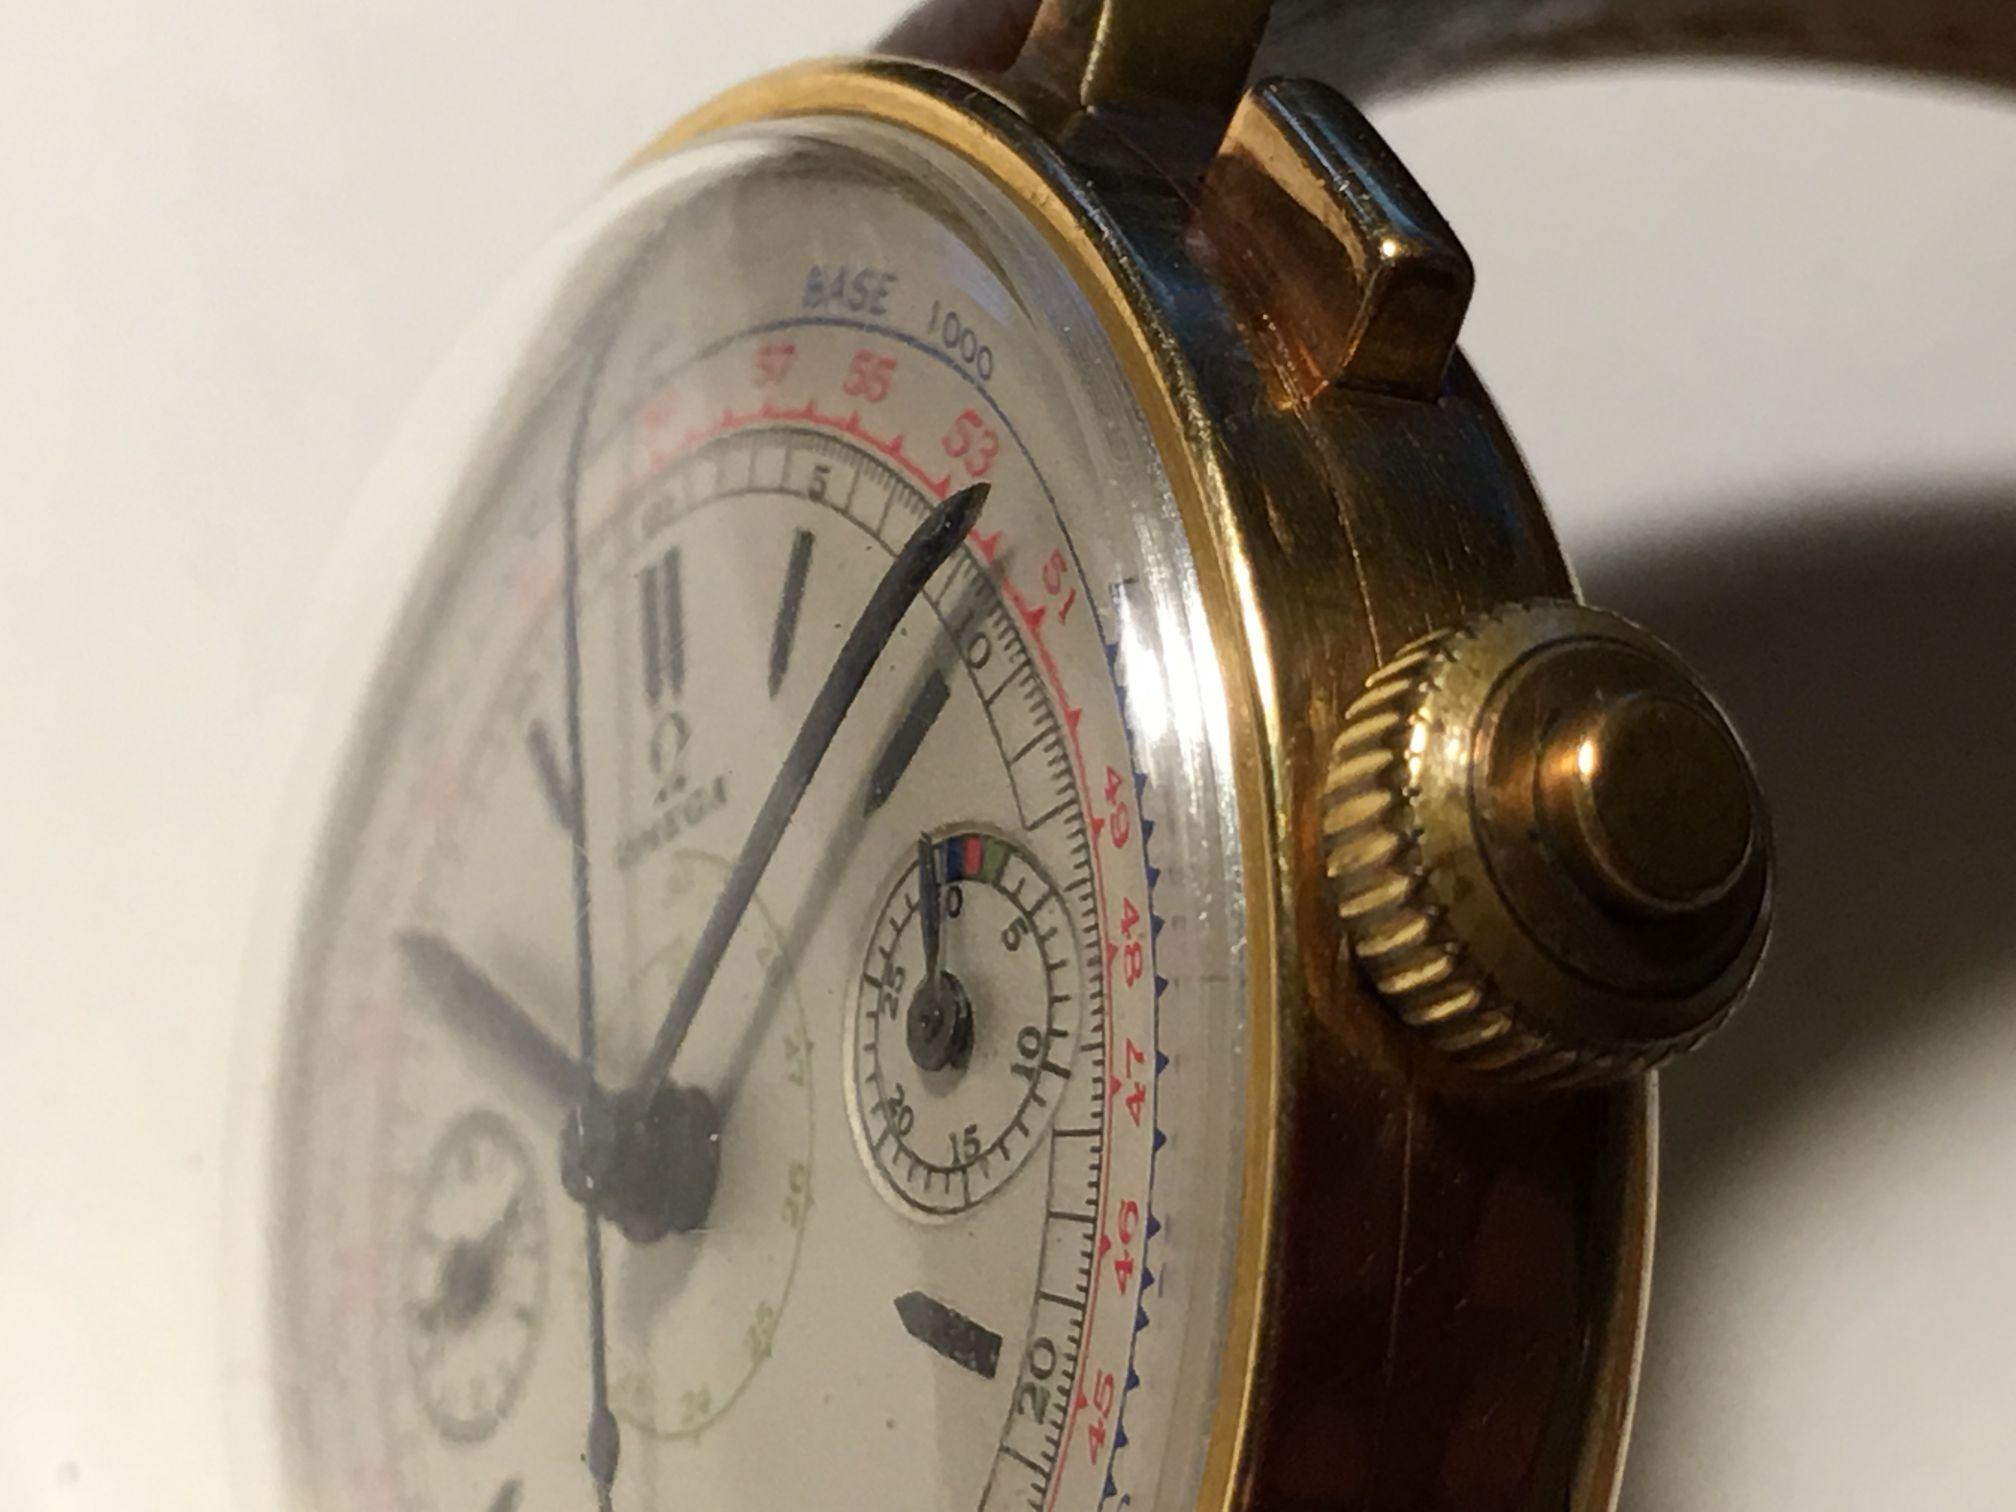 reloj omega militar, omega cronografo monopulsante